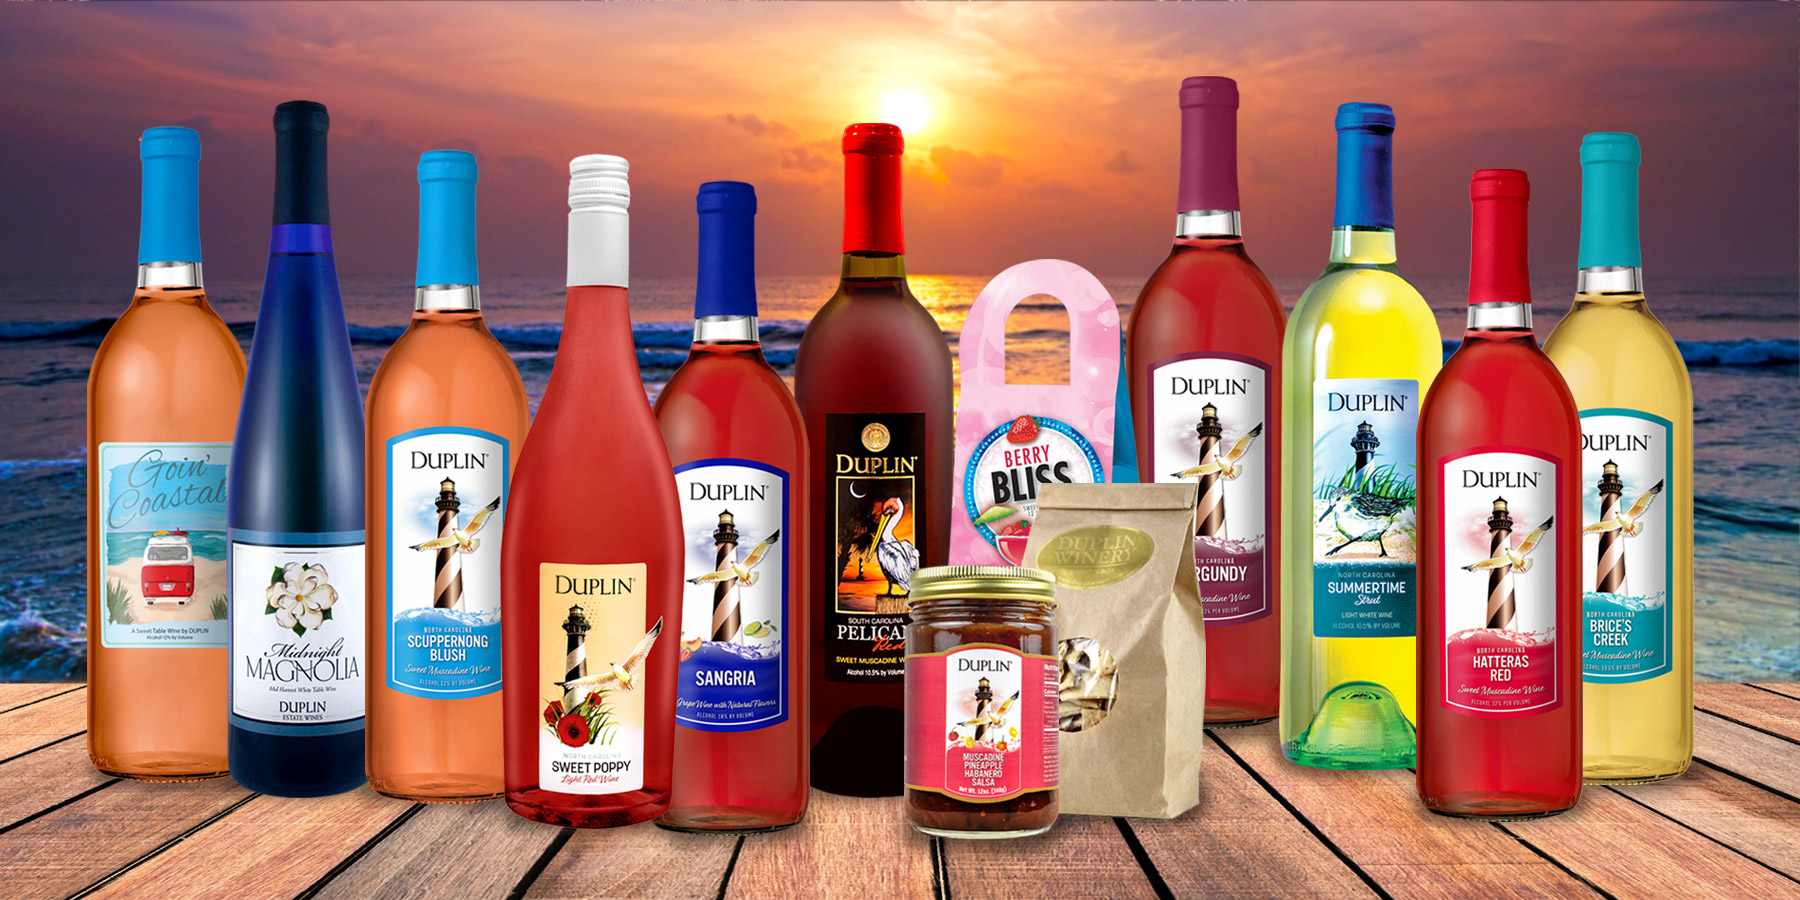 Duplin Winery's Seaside Wine Tasting Kit is summer vacation ready.